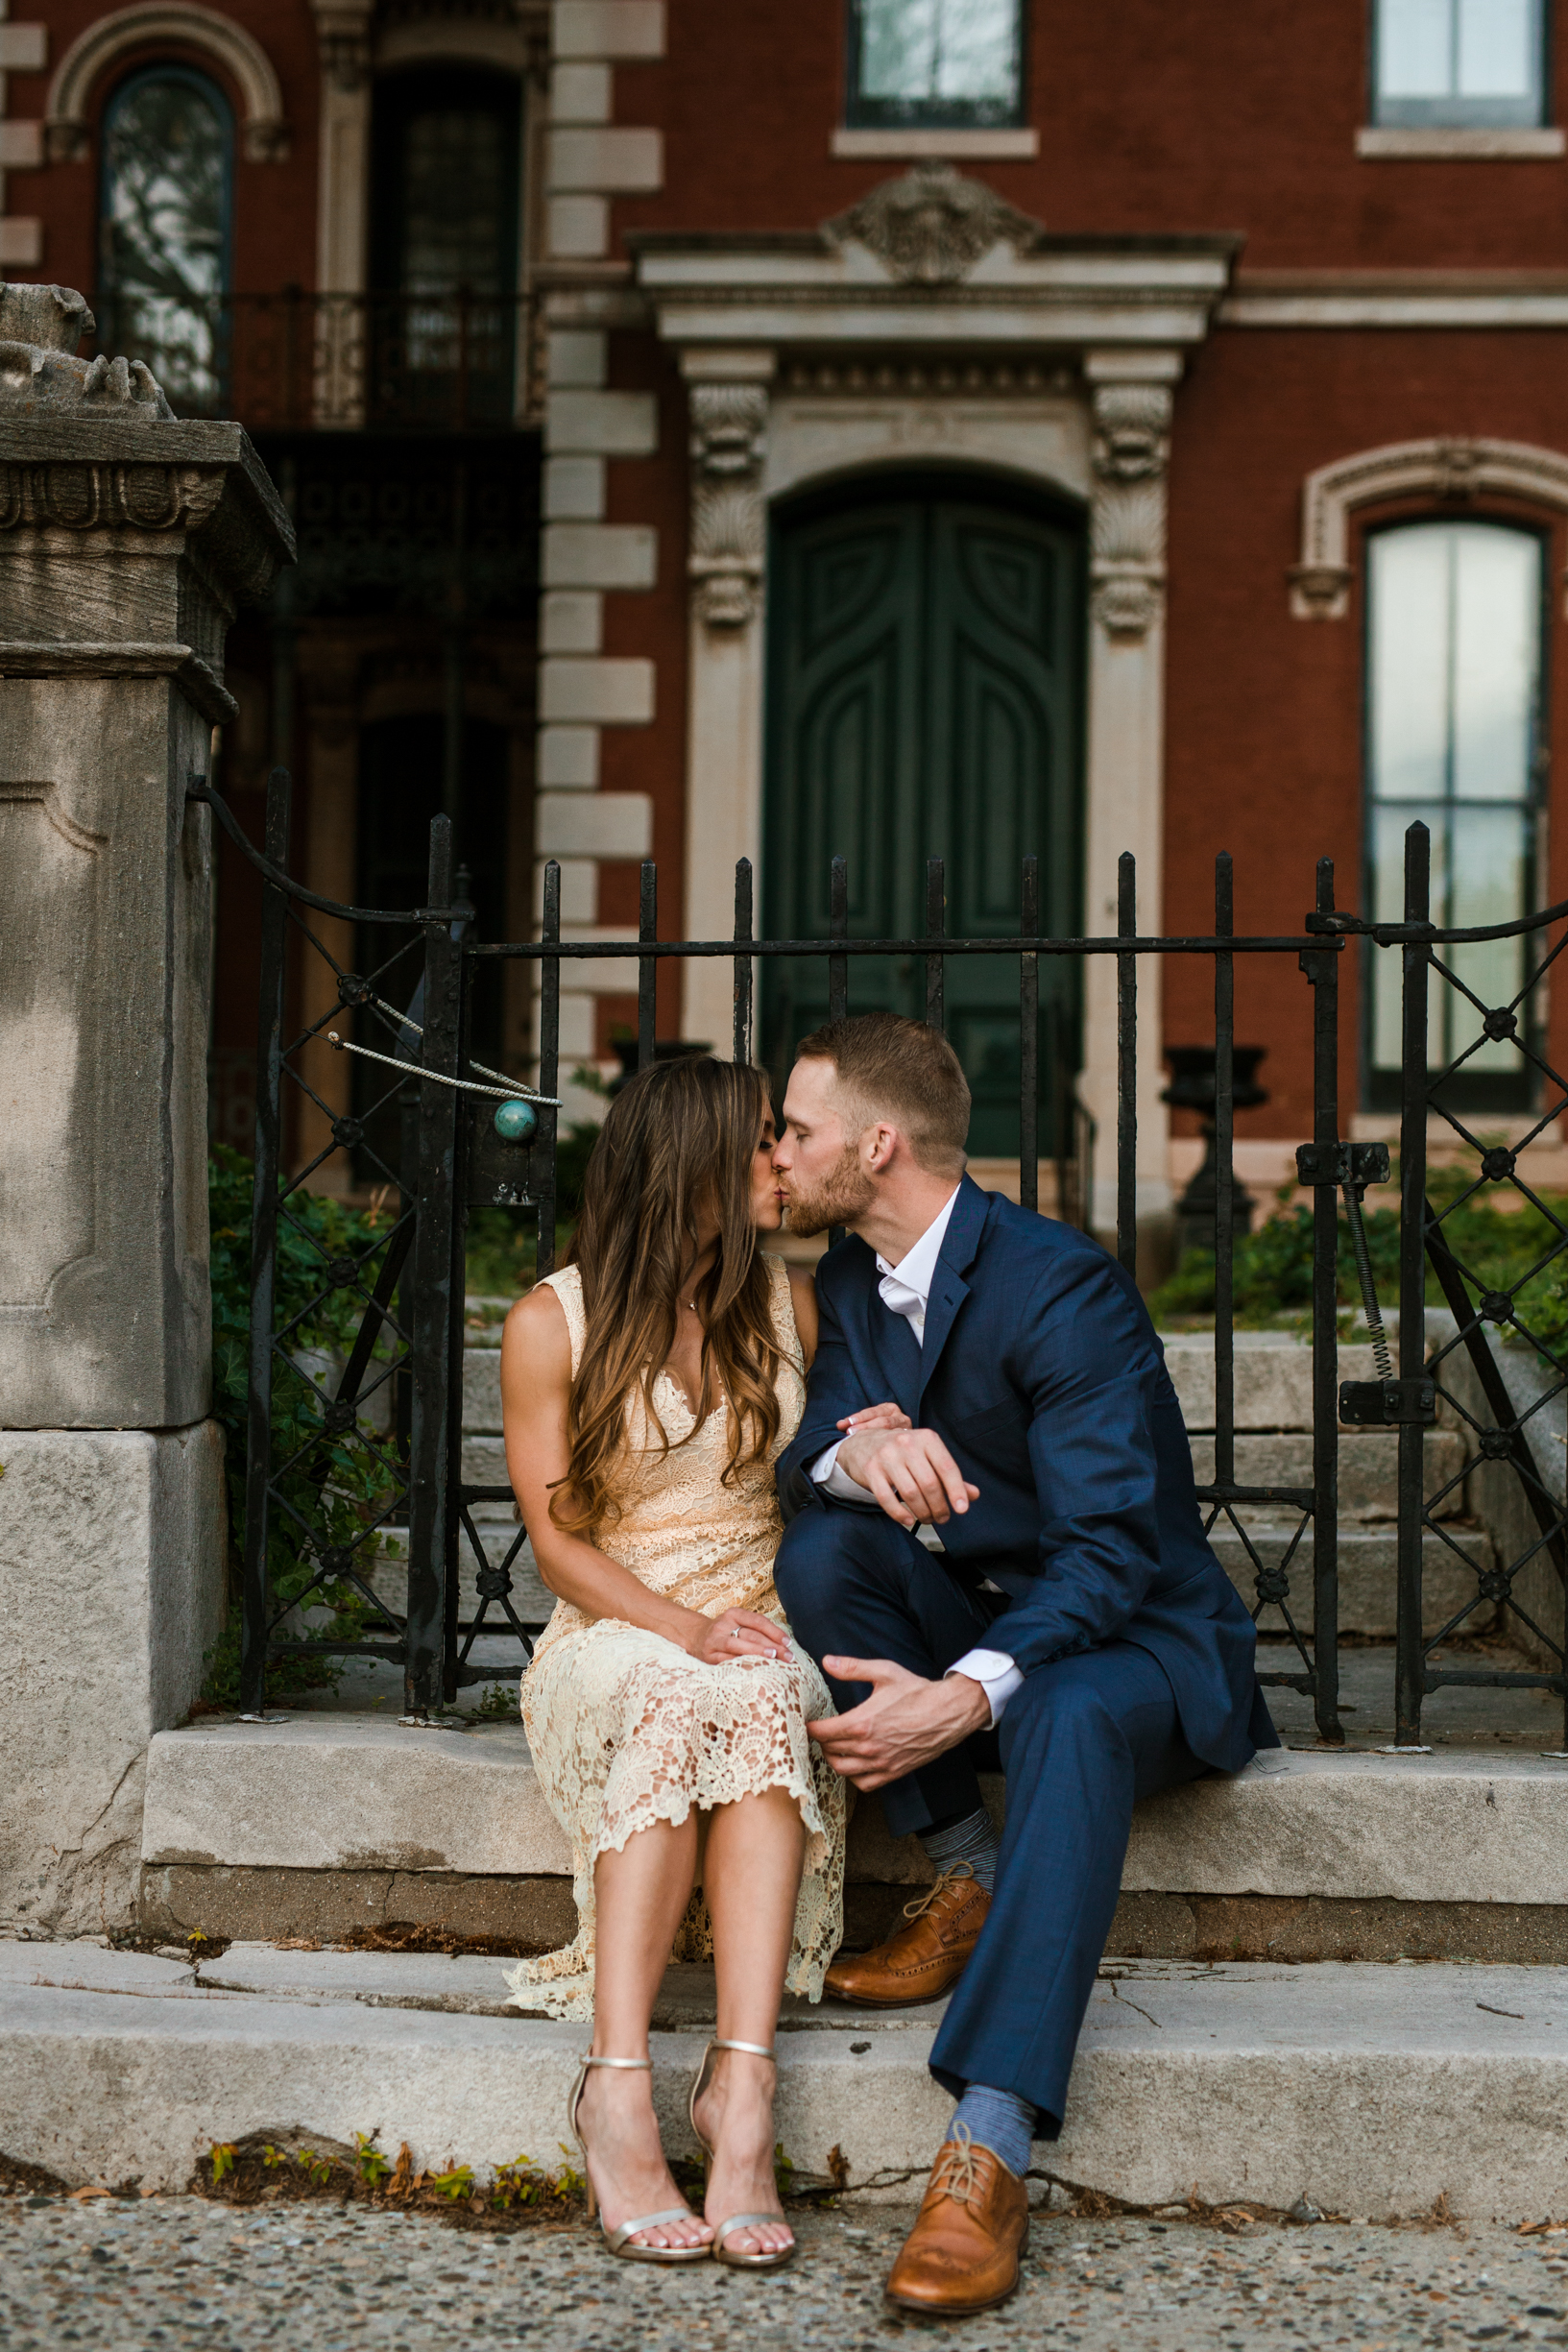 Victoria & Chad Engagement 2018 Crystal Ludwick Photo Louisville Kentucky Wedding Photographer WEBSITE (35 of 48).jpg